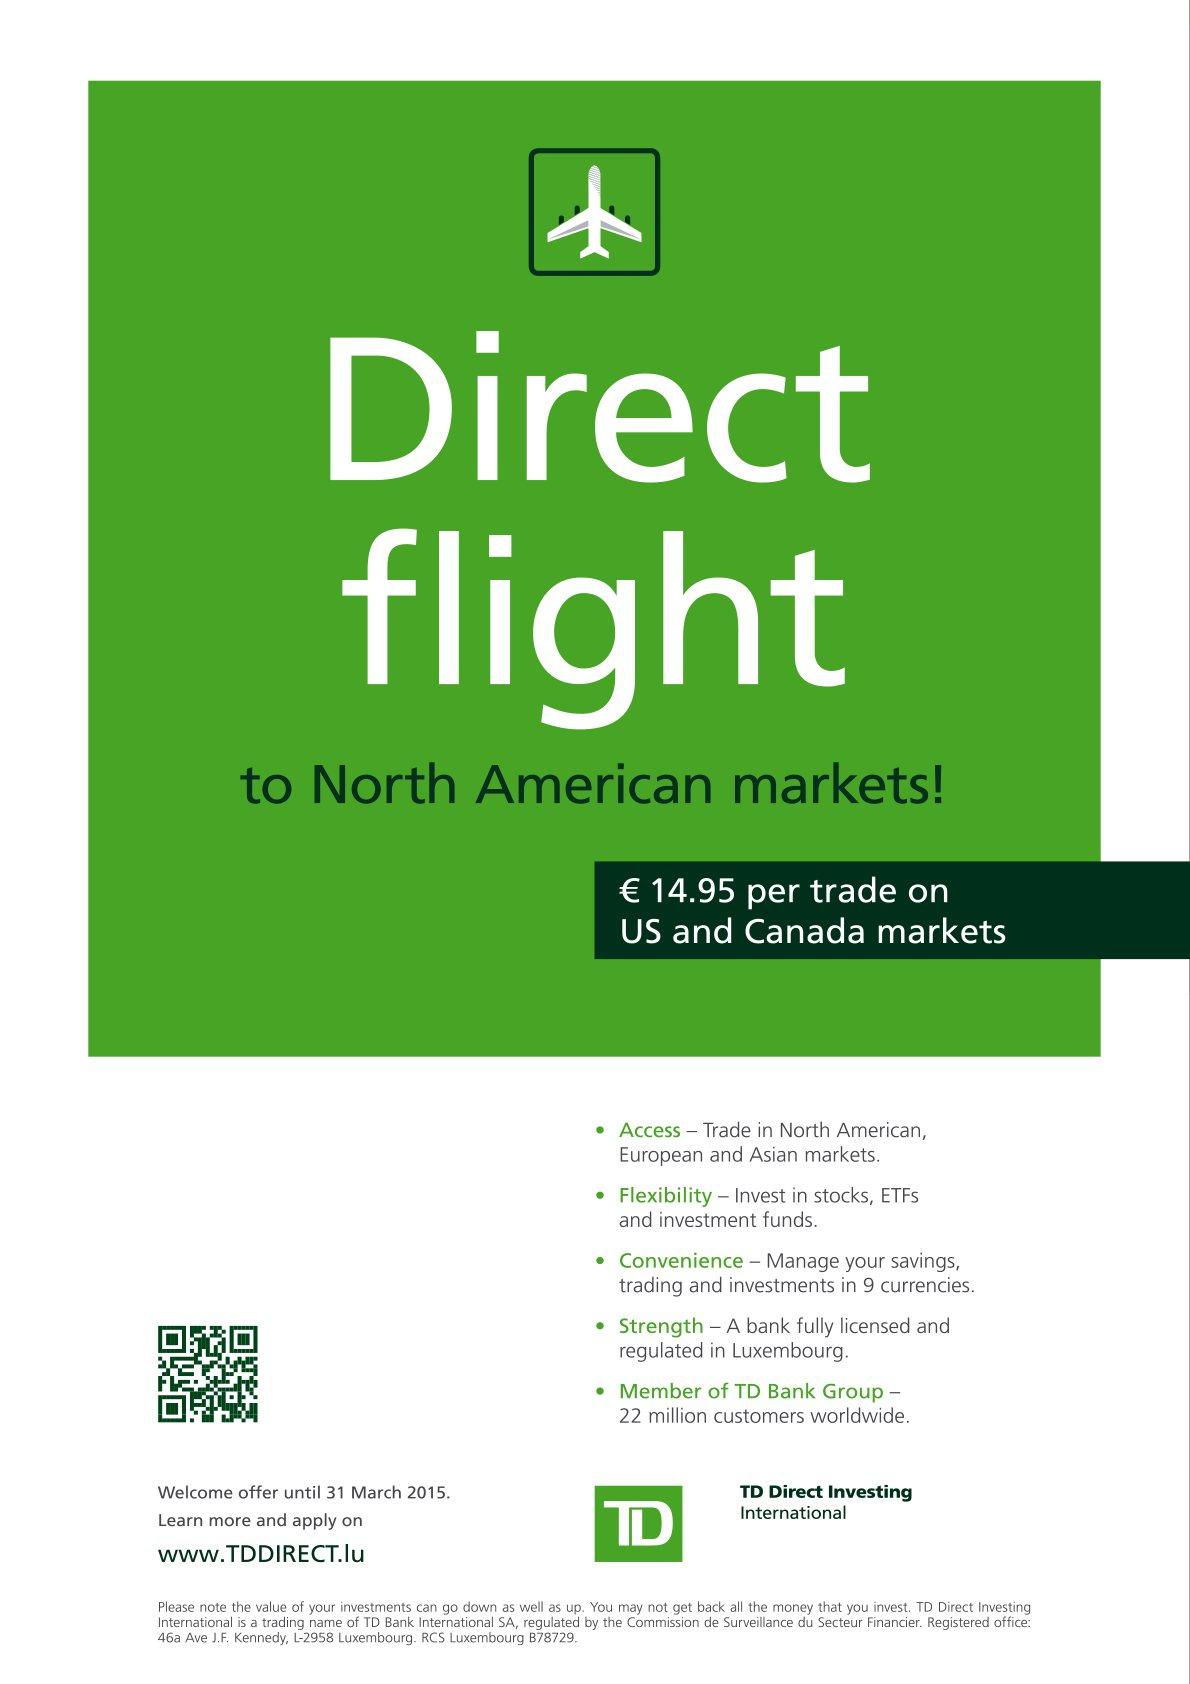 TD Direct Investing International -